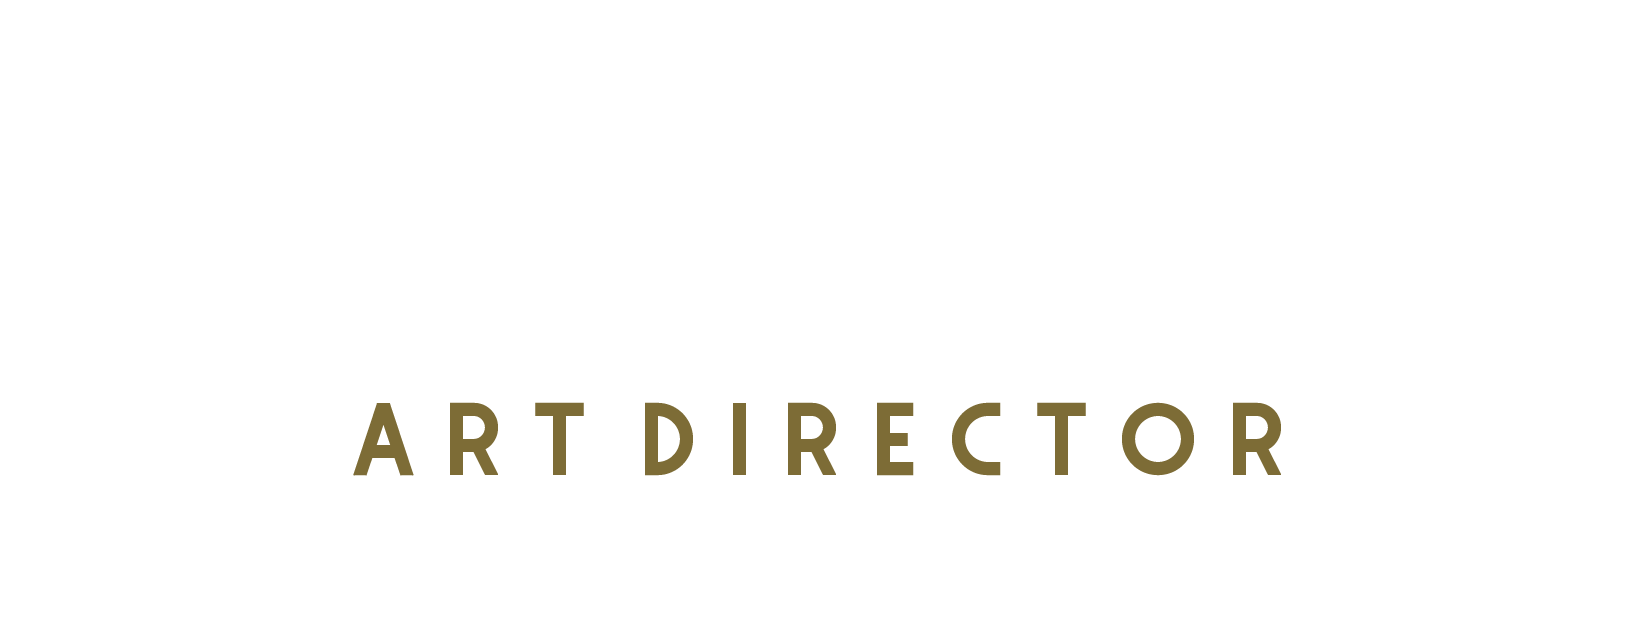 RODRIGO RJ - ART DIRECTOR